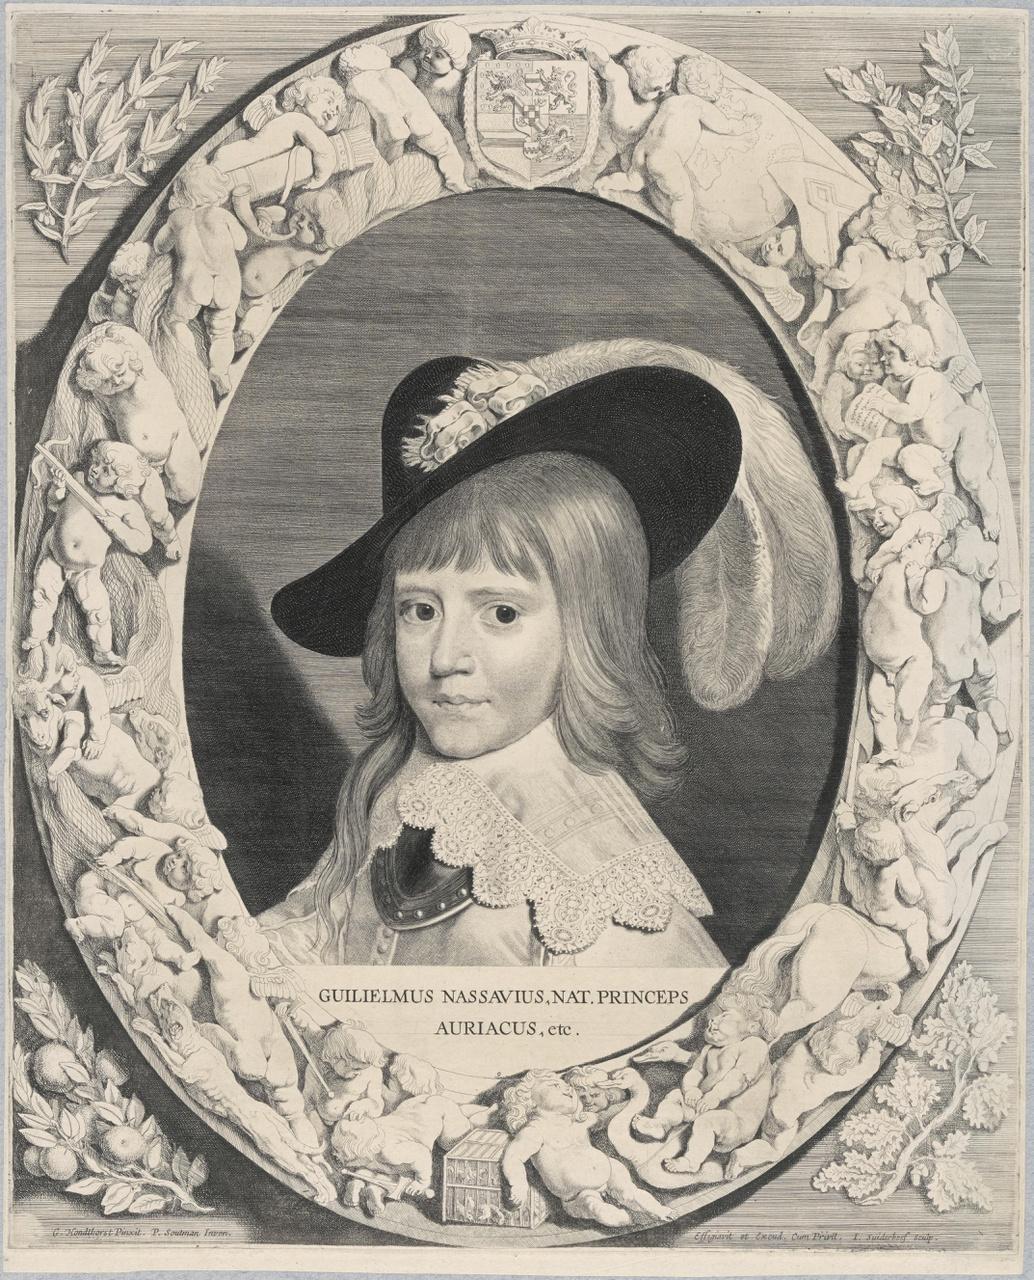 Portret van Willem II, als kind (1626-1650)